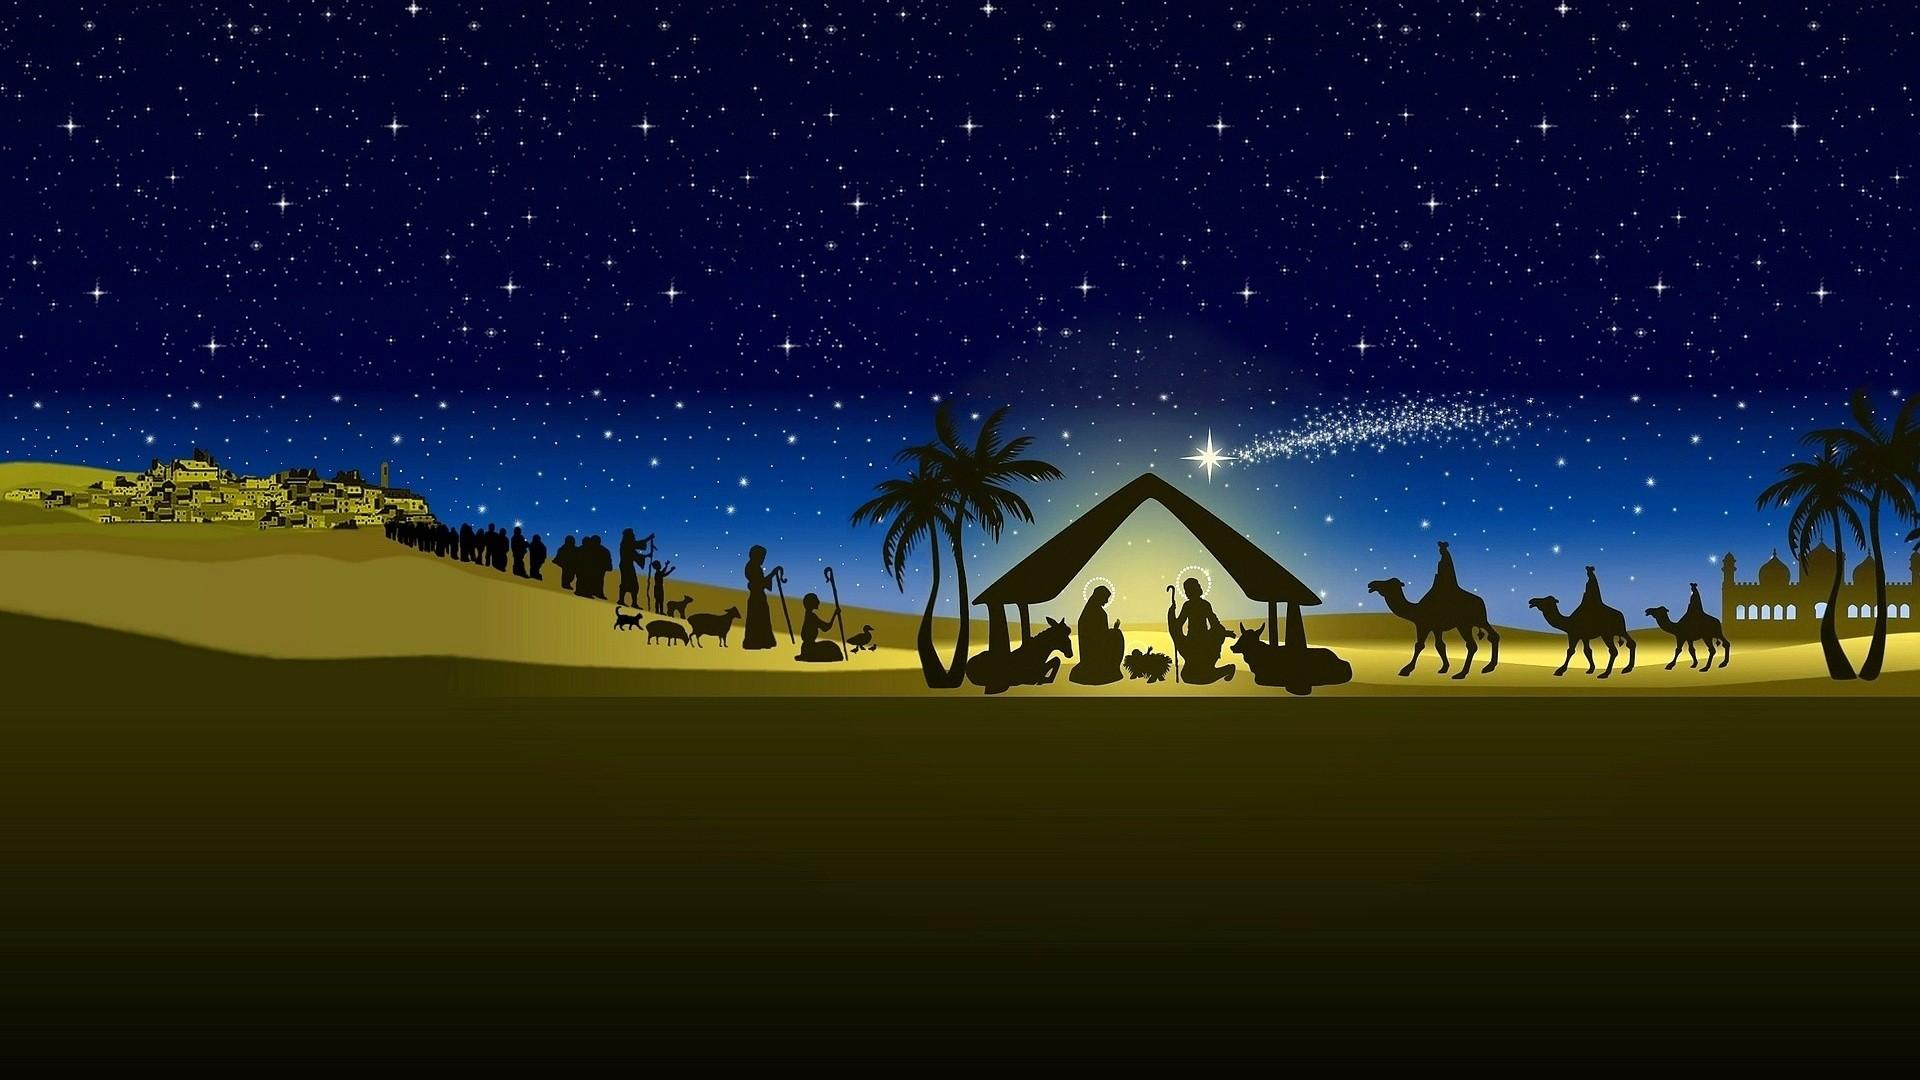 Religion, Christian, Christmas, Bethlehem Night, The Birth Of Jesus